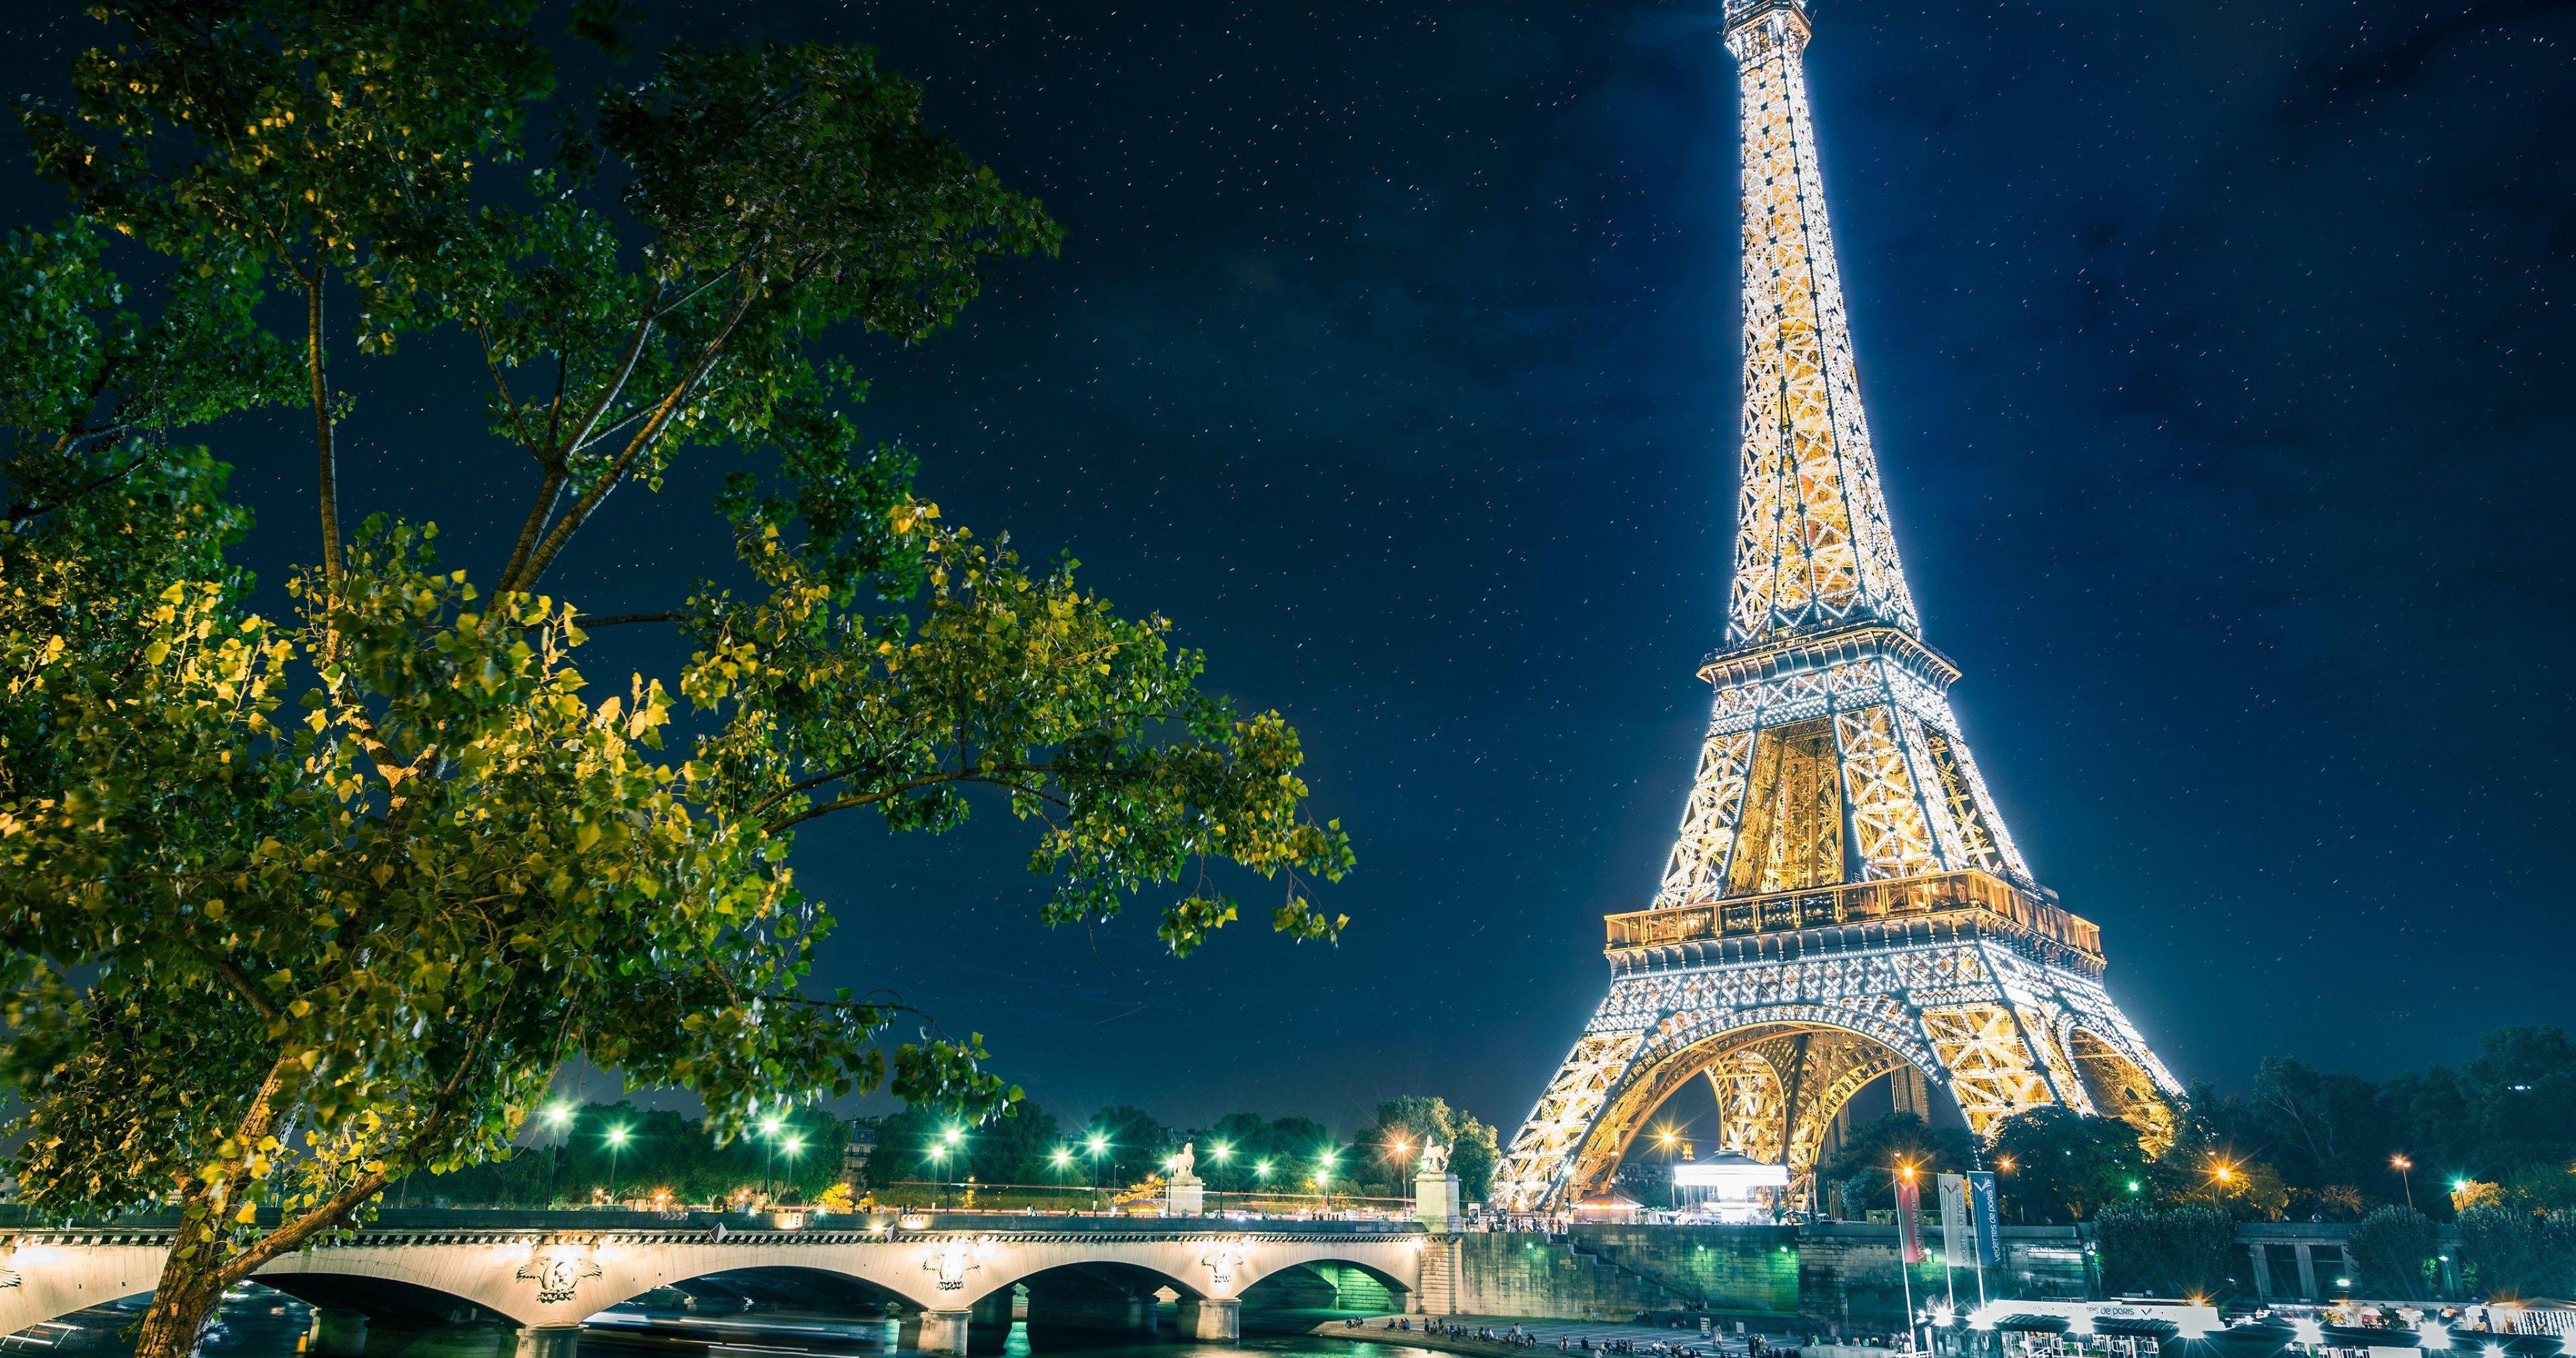 Eiffel Tower 4k Wallpapers Wallpaper Cave